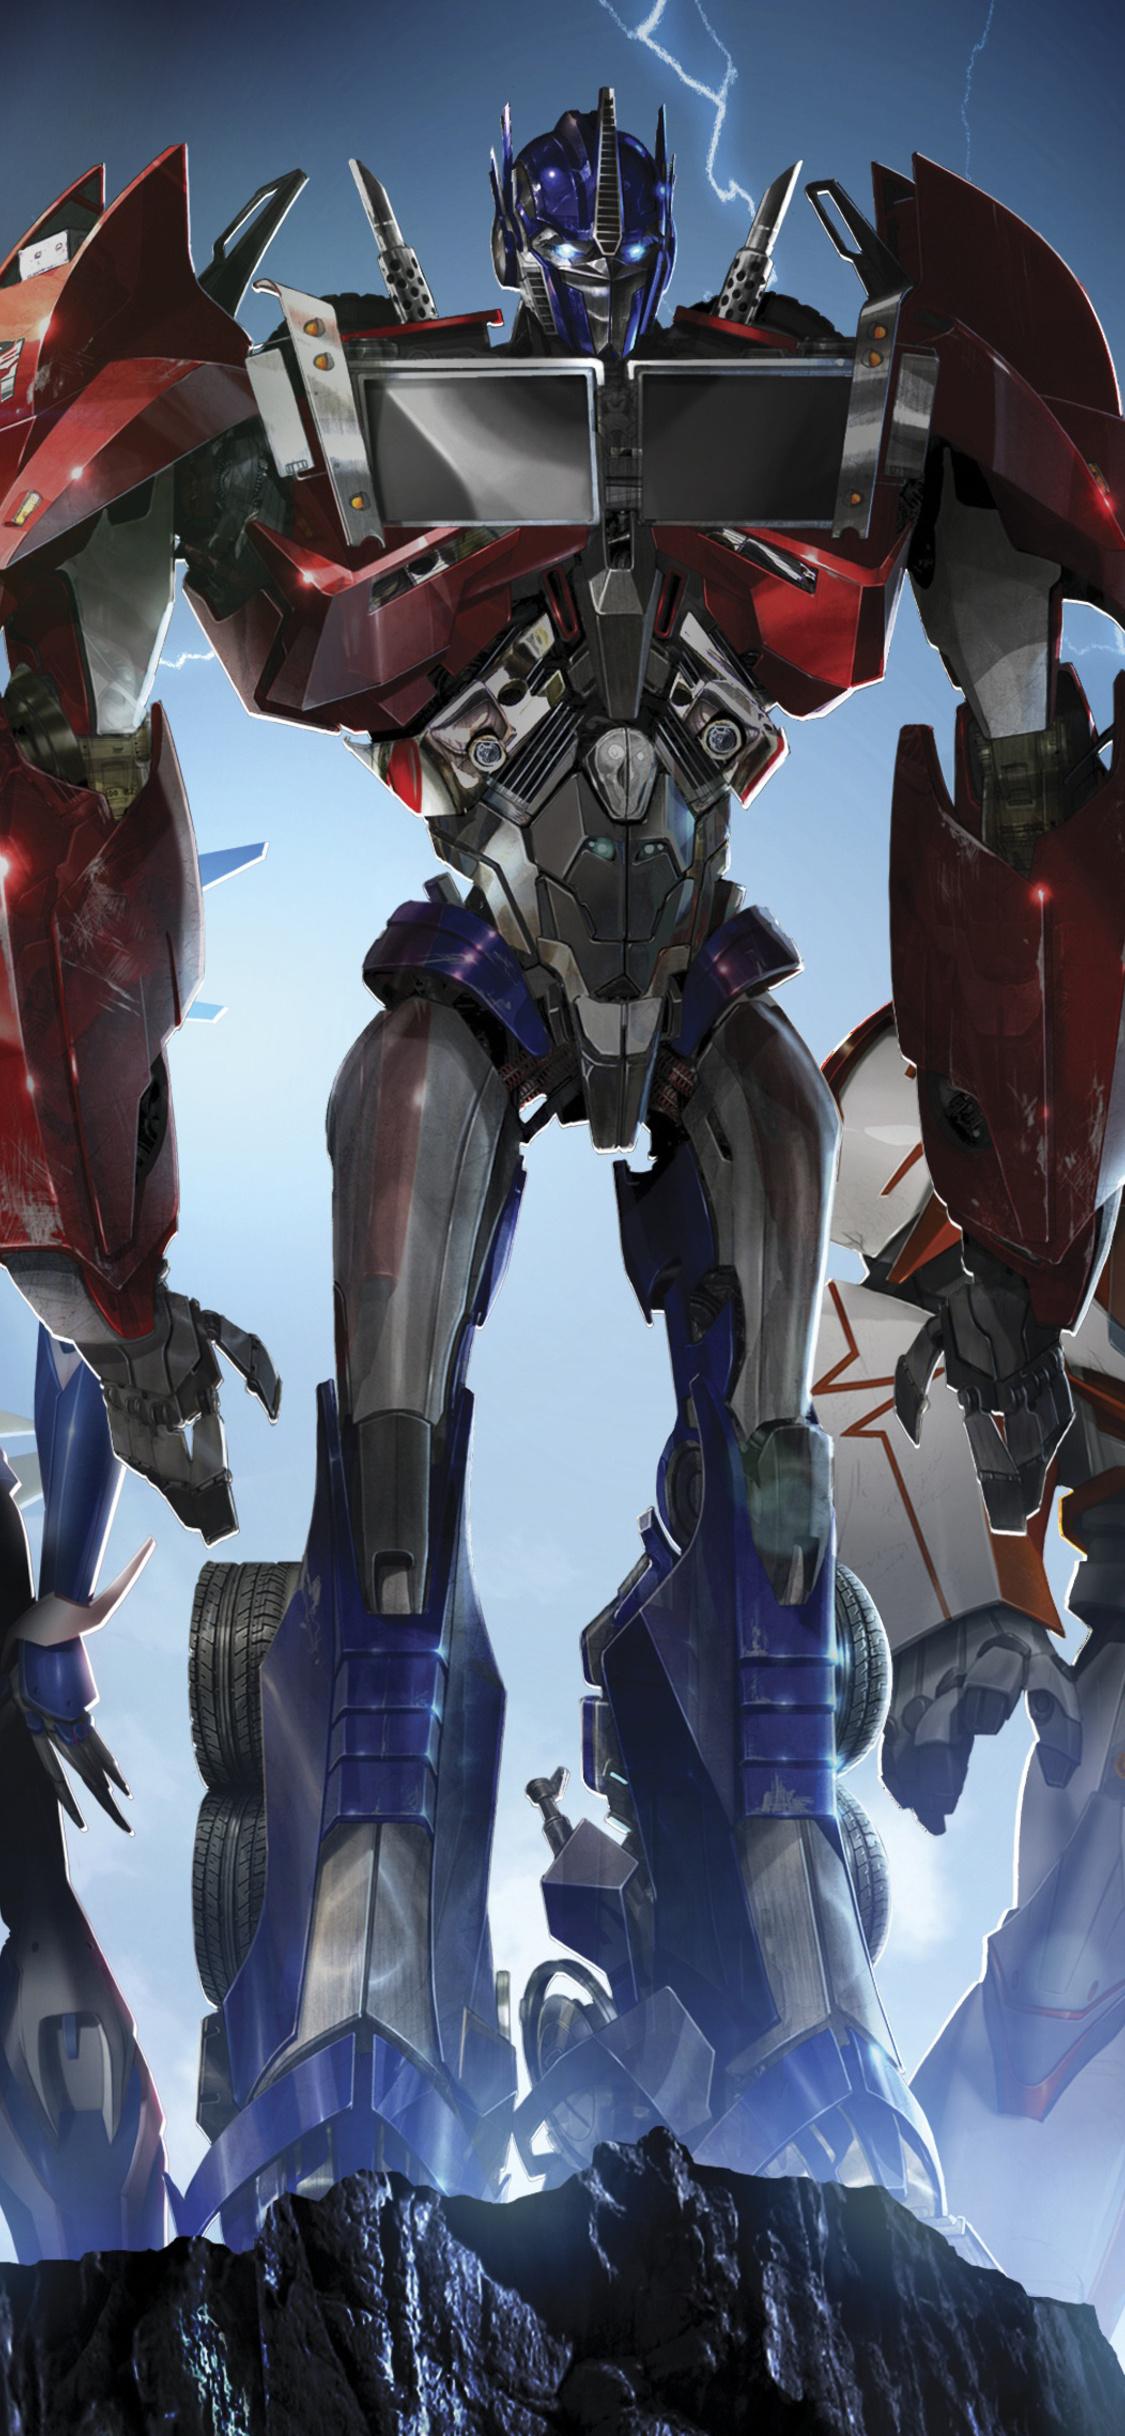 1125x2436 Transformers Prime Iphone Xs Iphone 10 Iphone X Hd